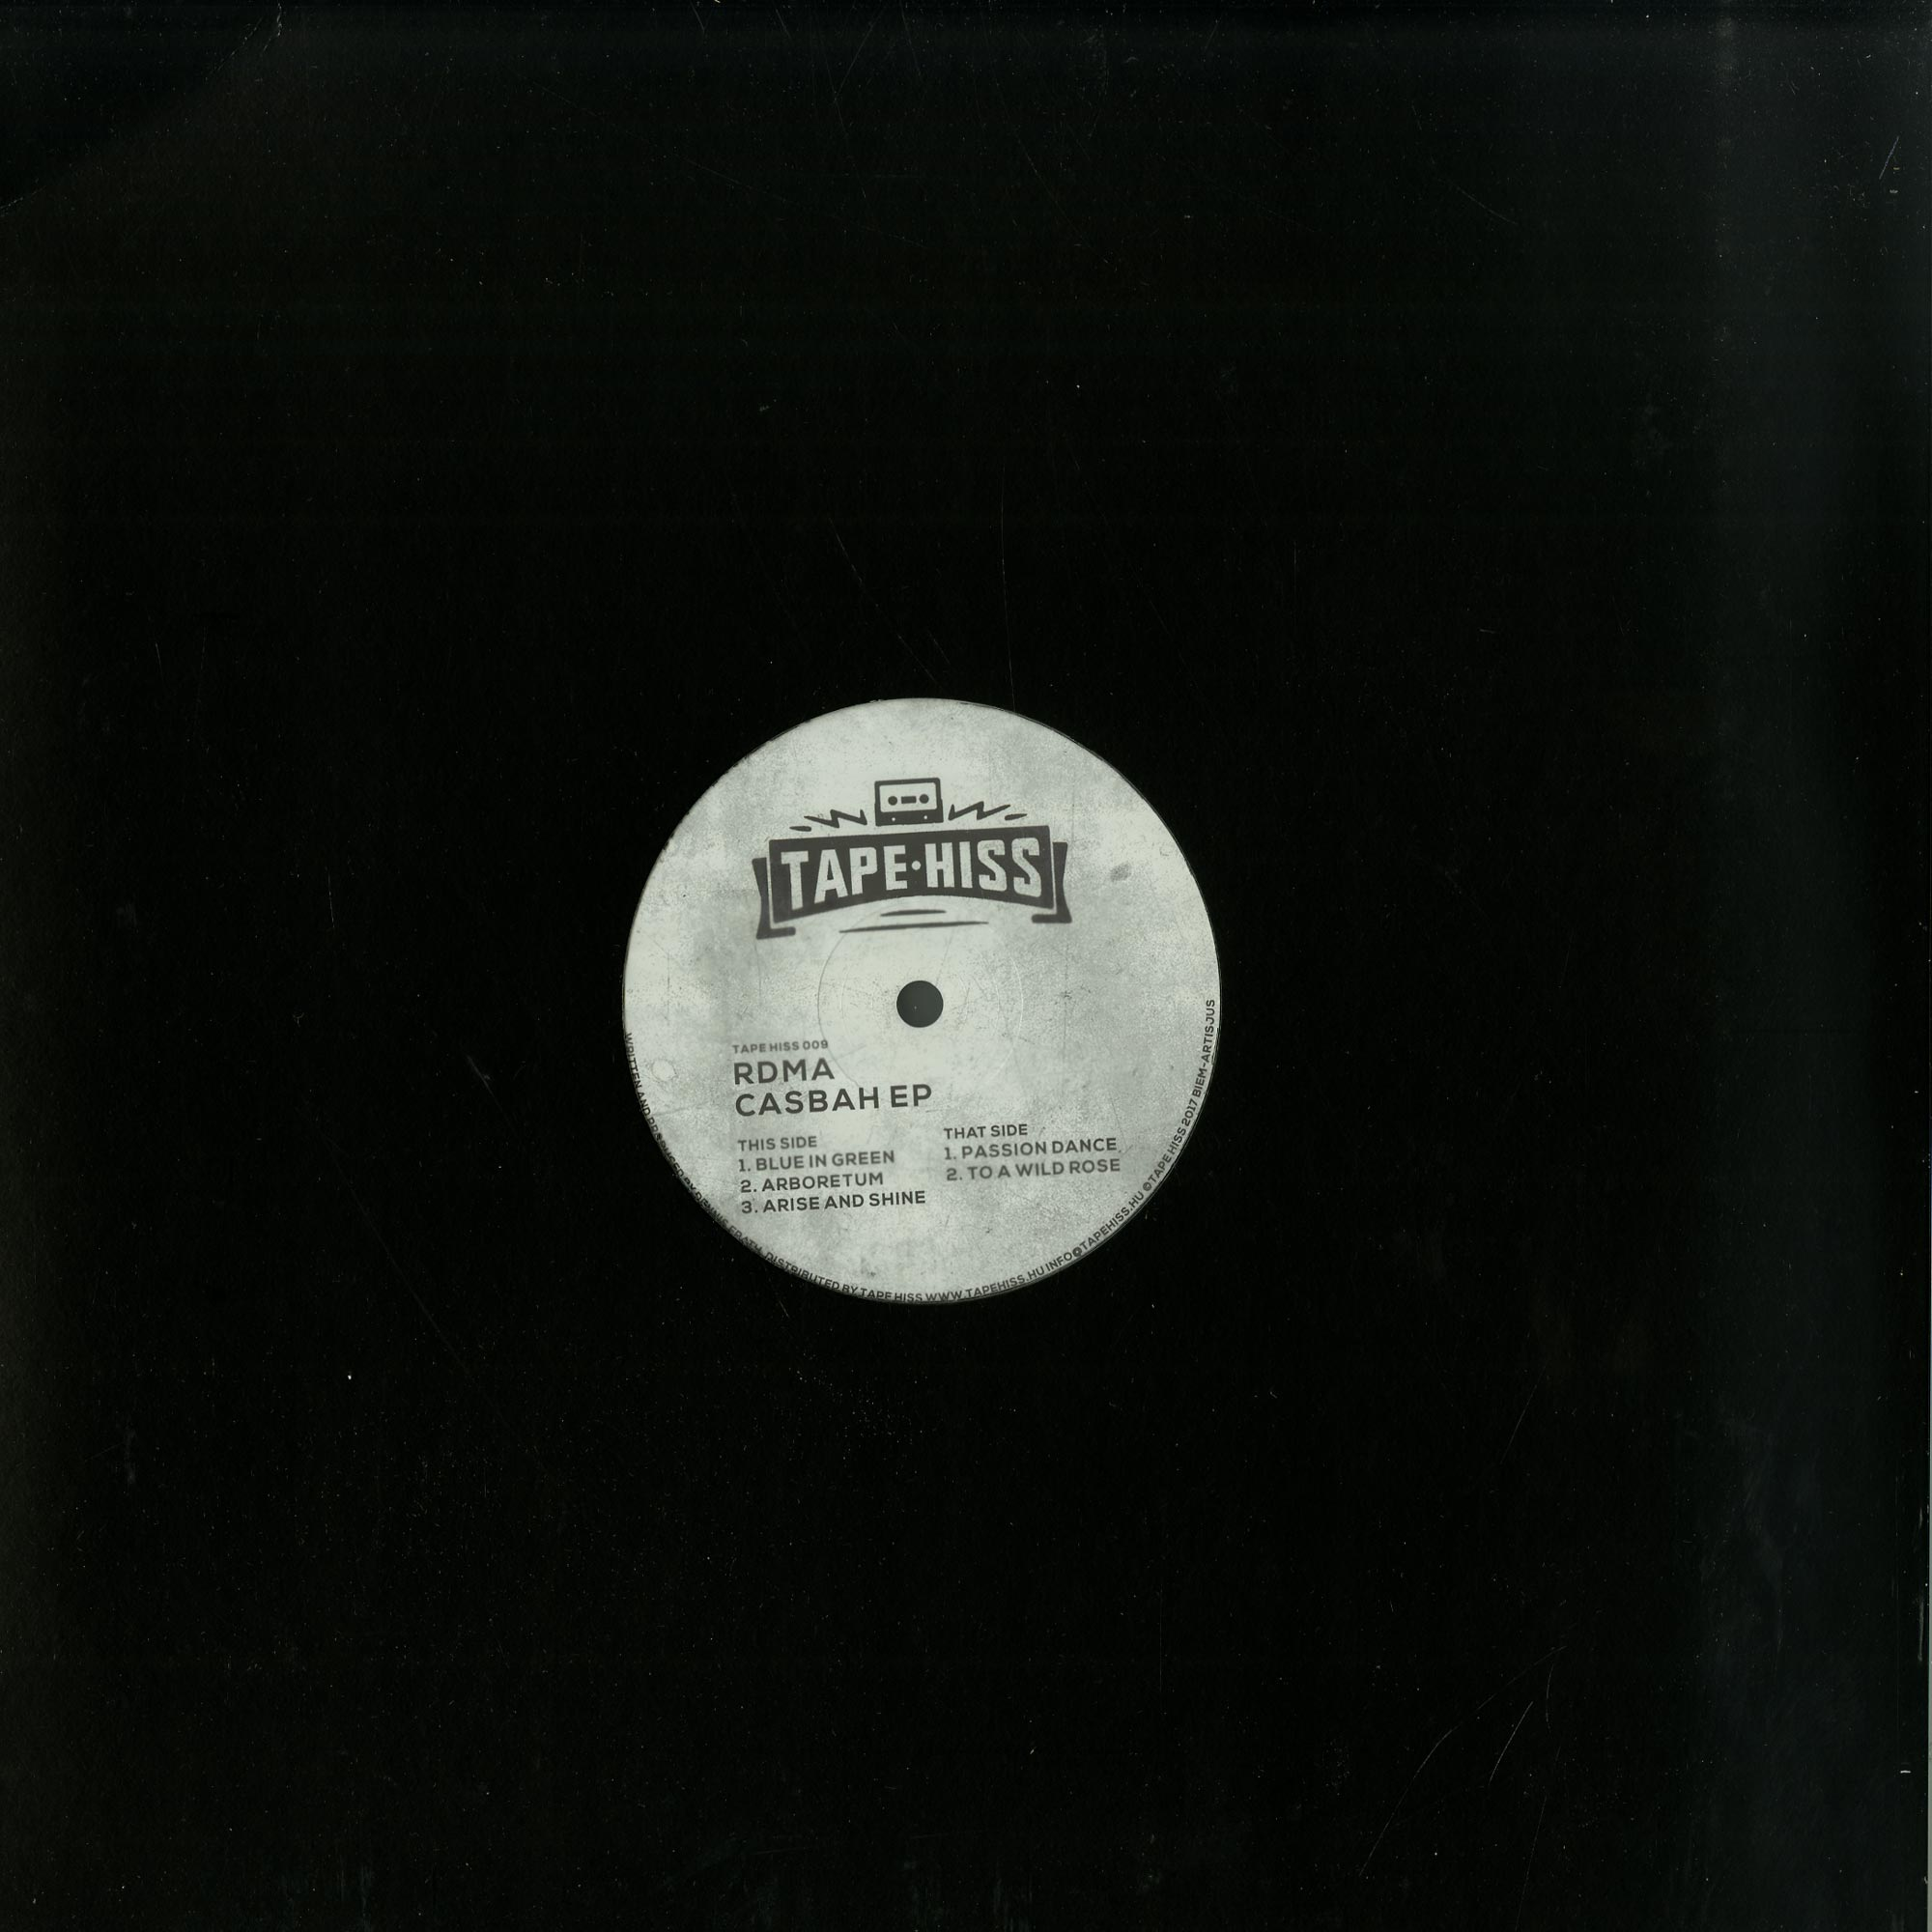 RDMA - CASBAH EP